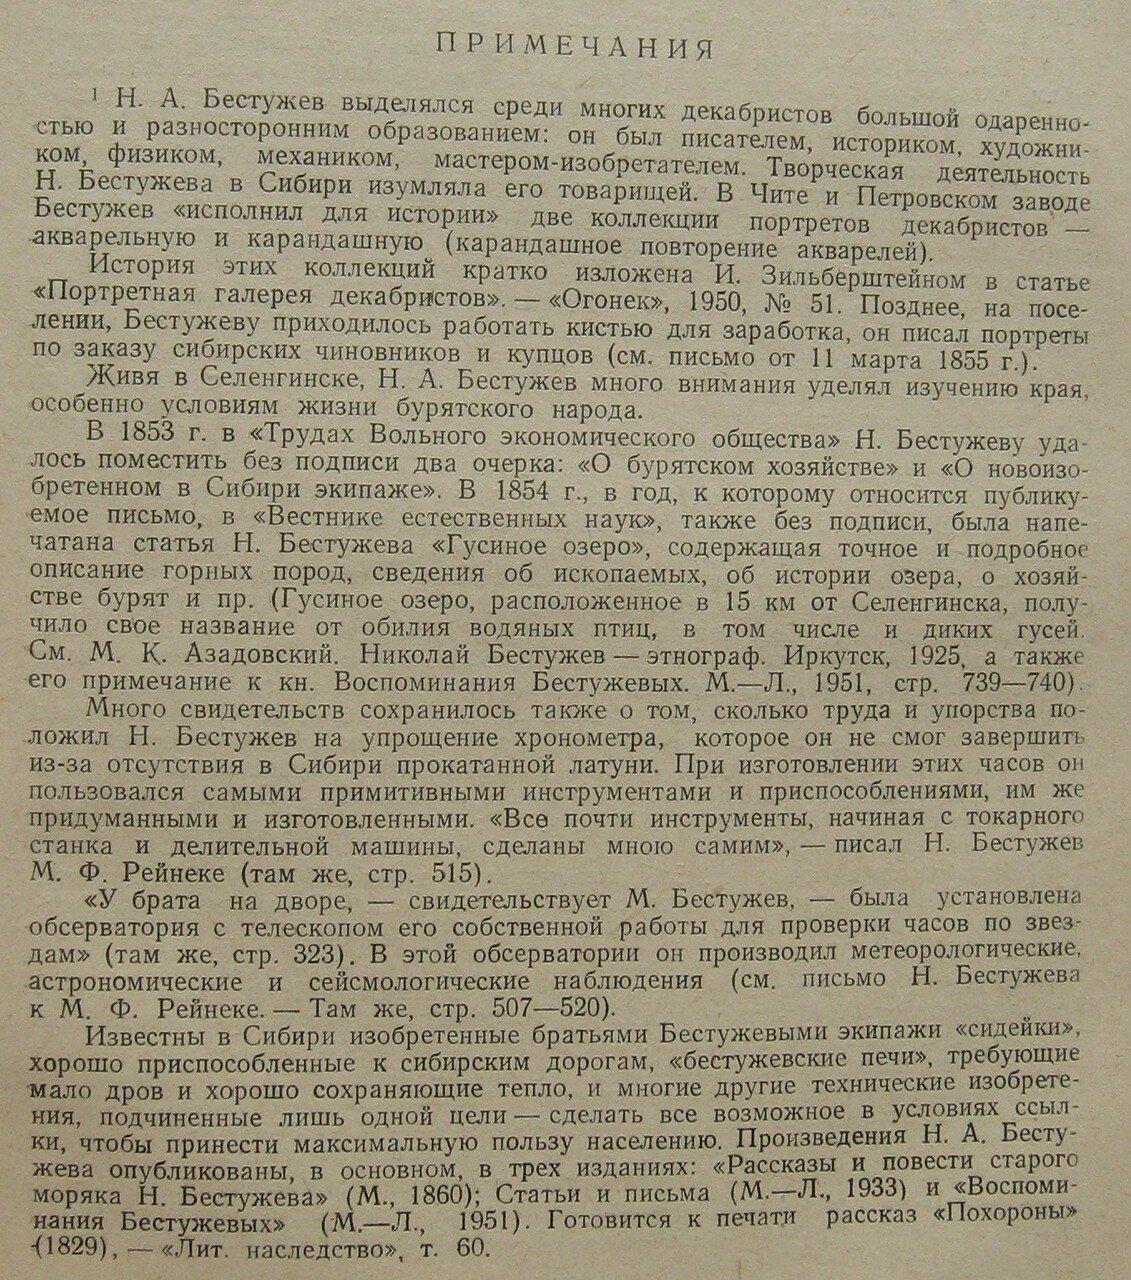 https://img-fotki.yandex.ru/get/249078/199368979.52/0_1fdd29_95099b1d_XXXL.jpg